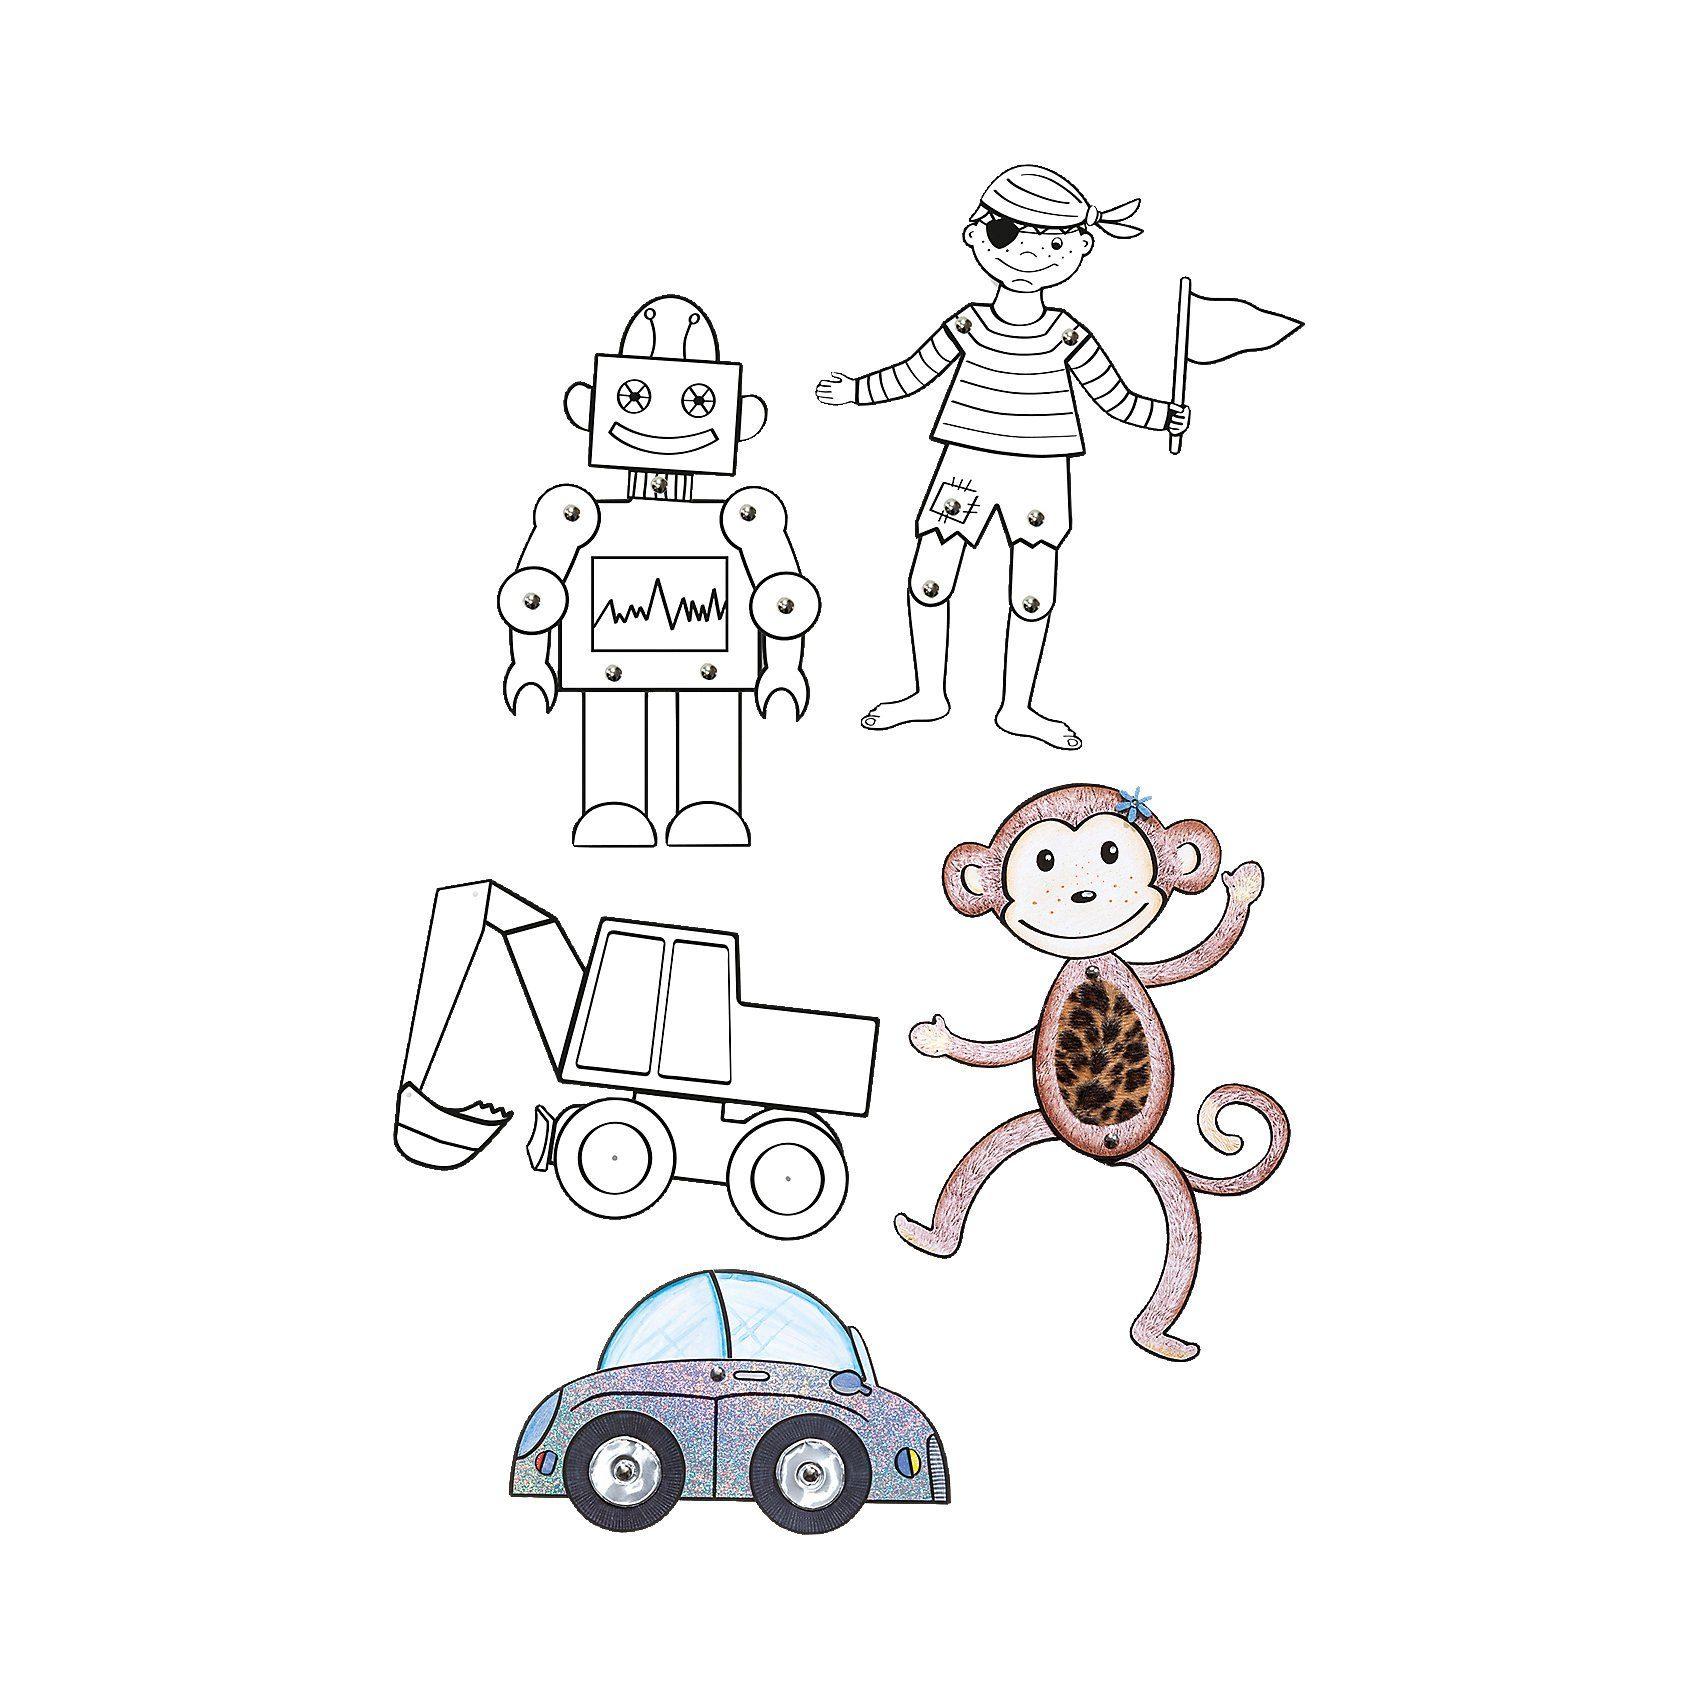 Folia Gelenkfiguren Abenteuerland, 5 Stück